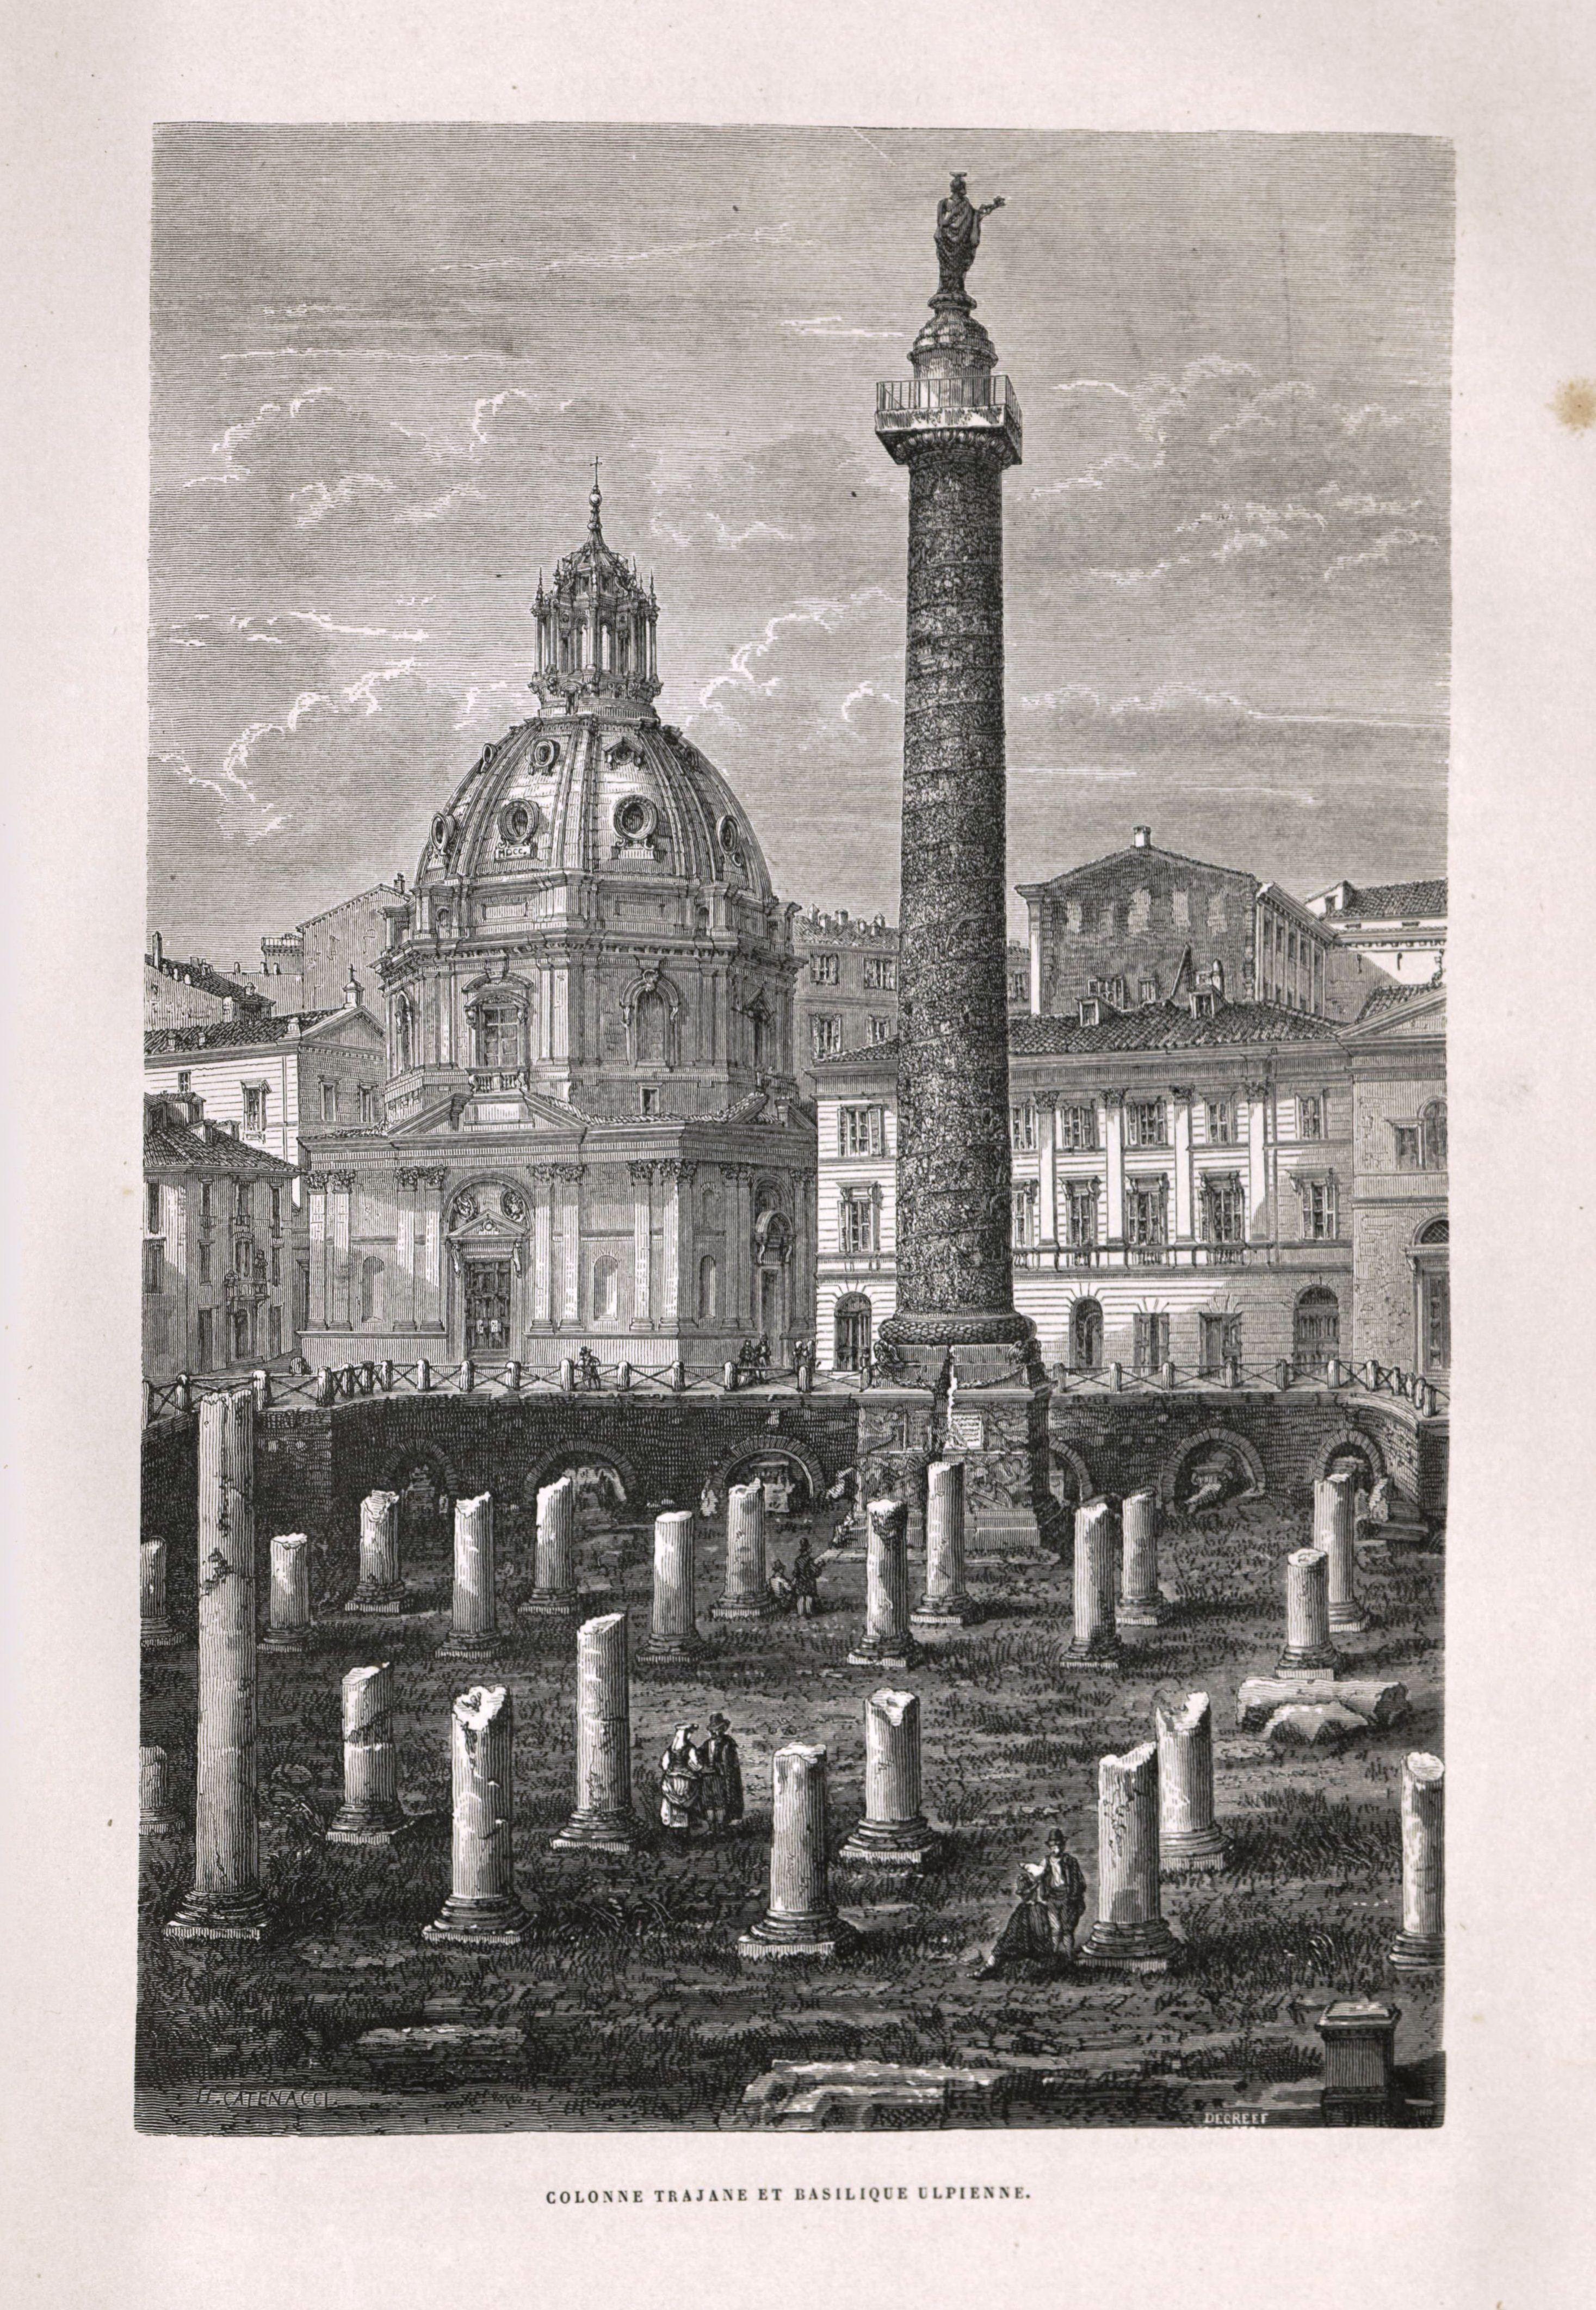 Columna Trajana y Basílica Ulpiana.